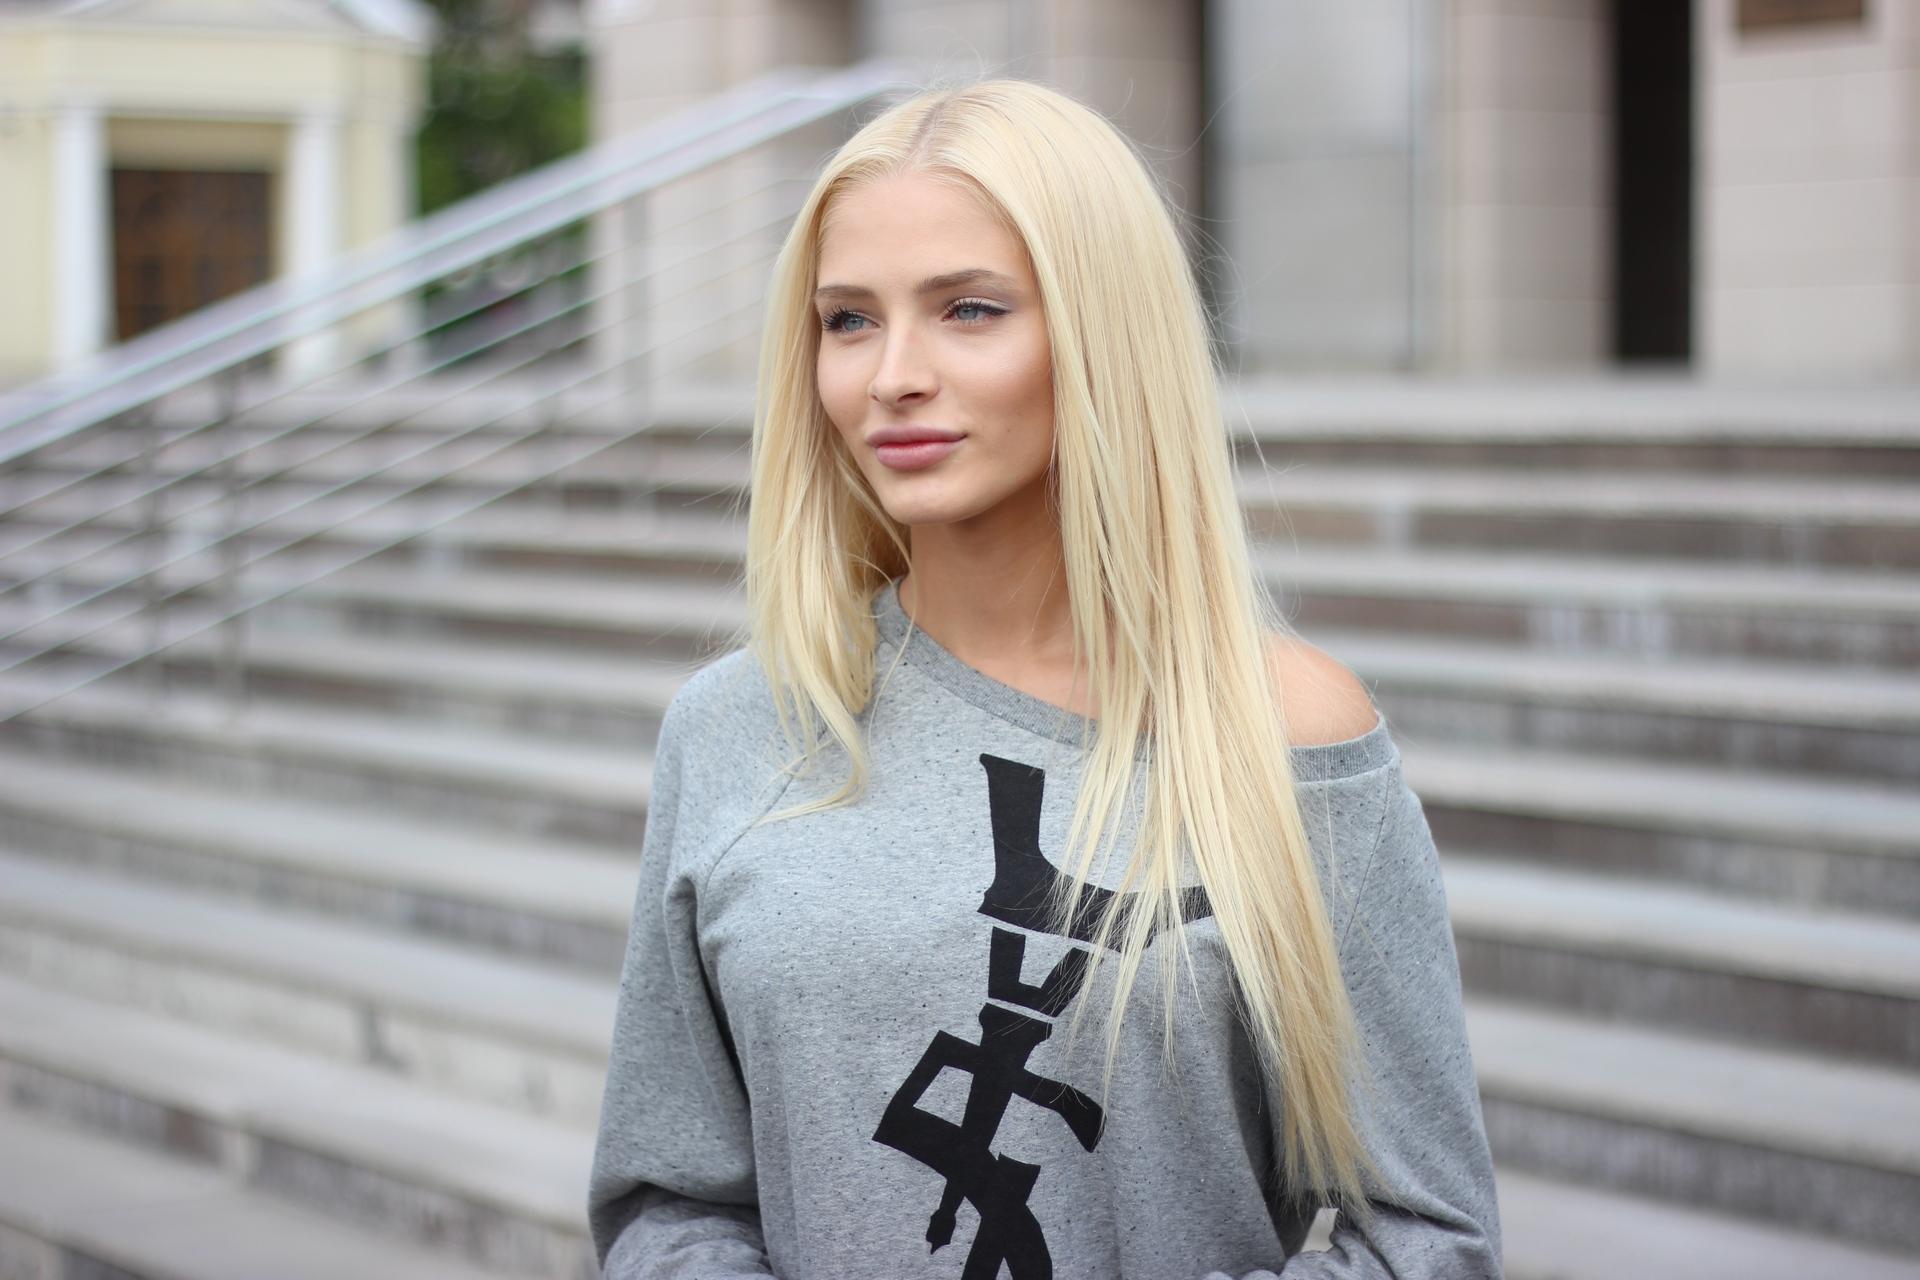 Alena Shishkova Women Model Blue Eyes Blonde Long Hair Urban Outdoors Russian 1920x1280